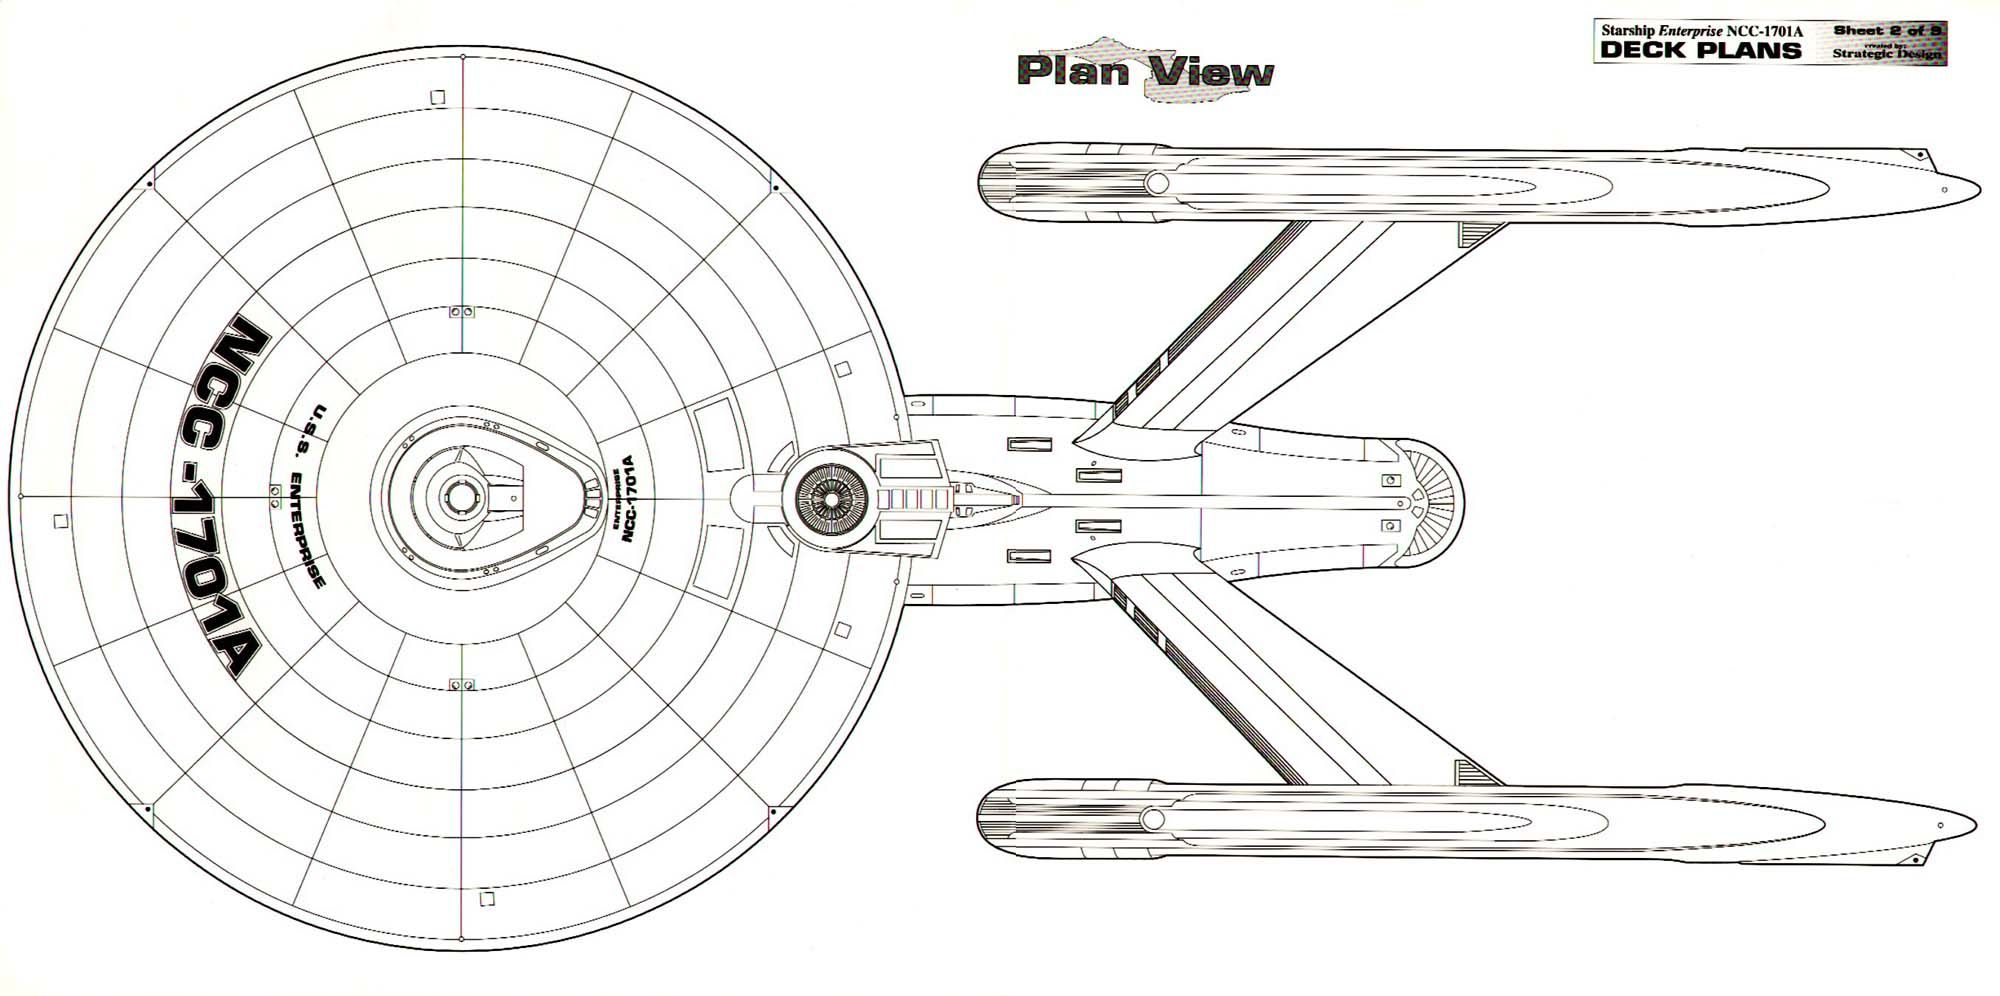 Dorsal Schematic Of U S S Enterprise Ncc A